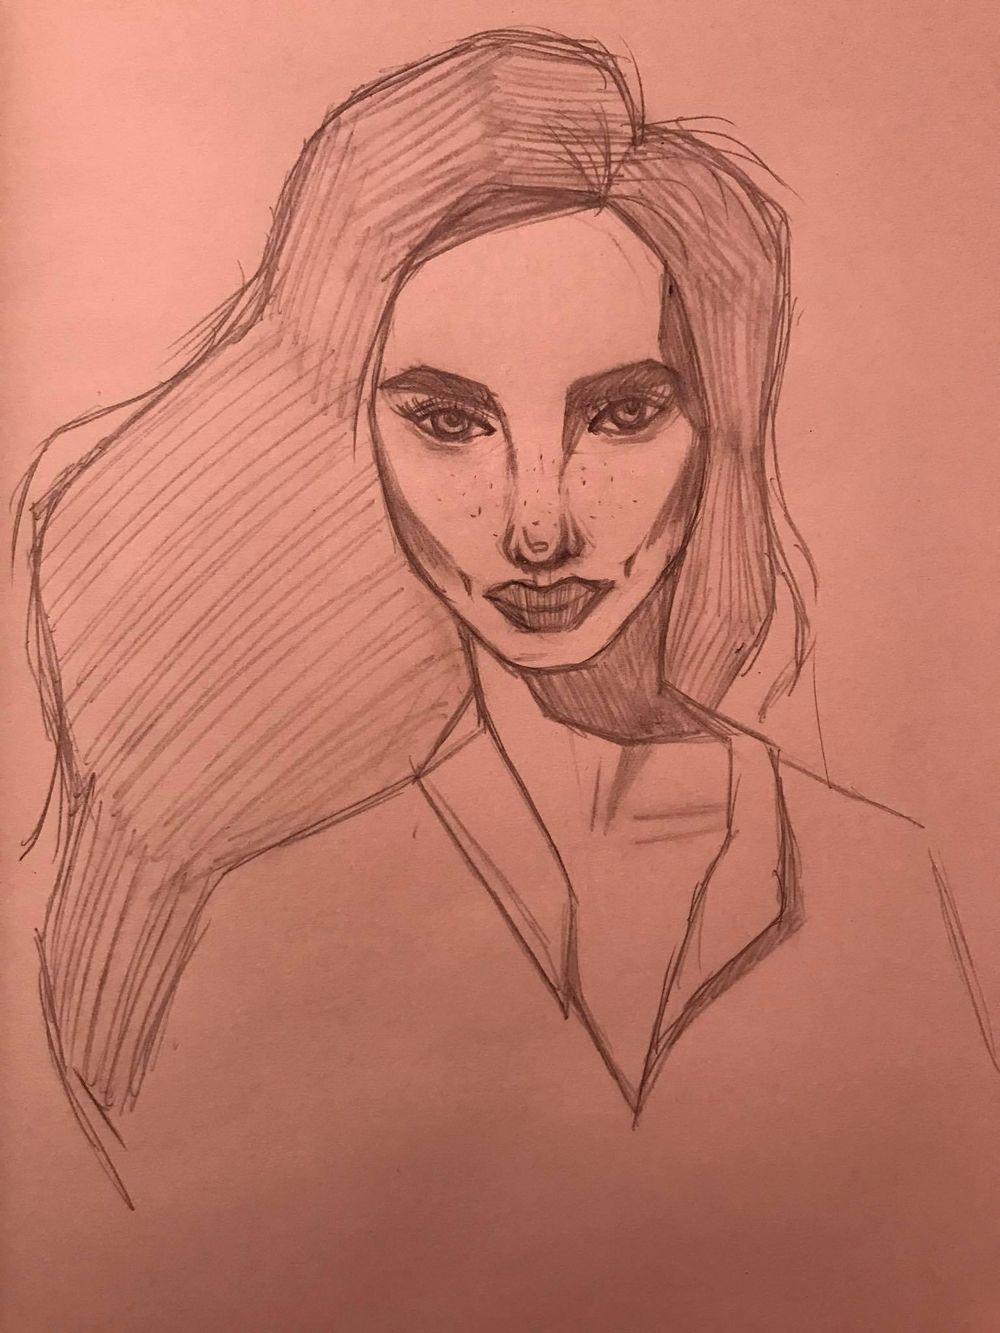 Daniela Salinas - image 3 - student project